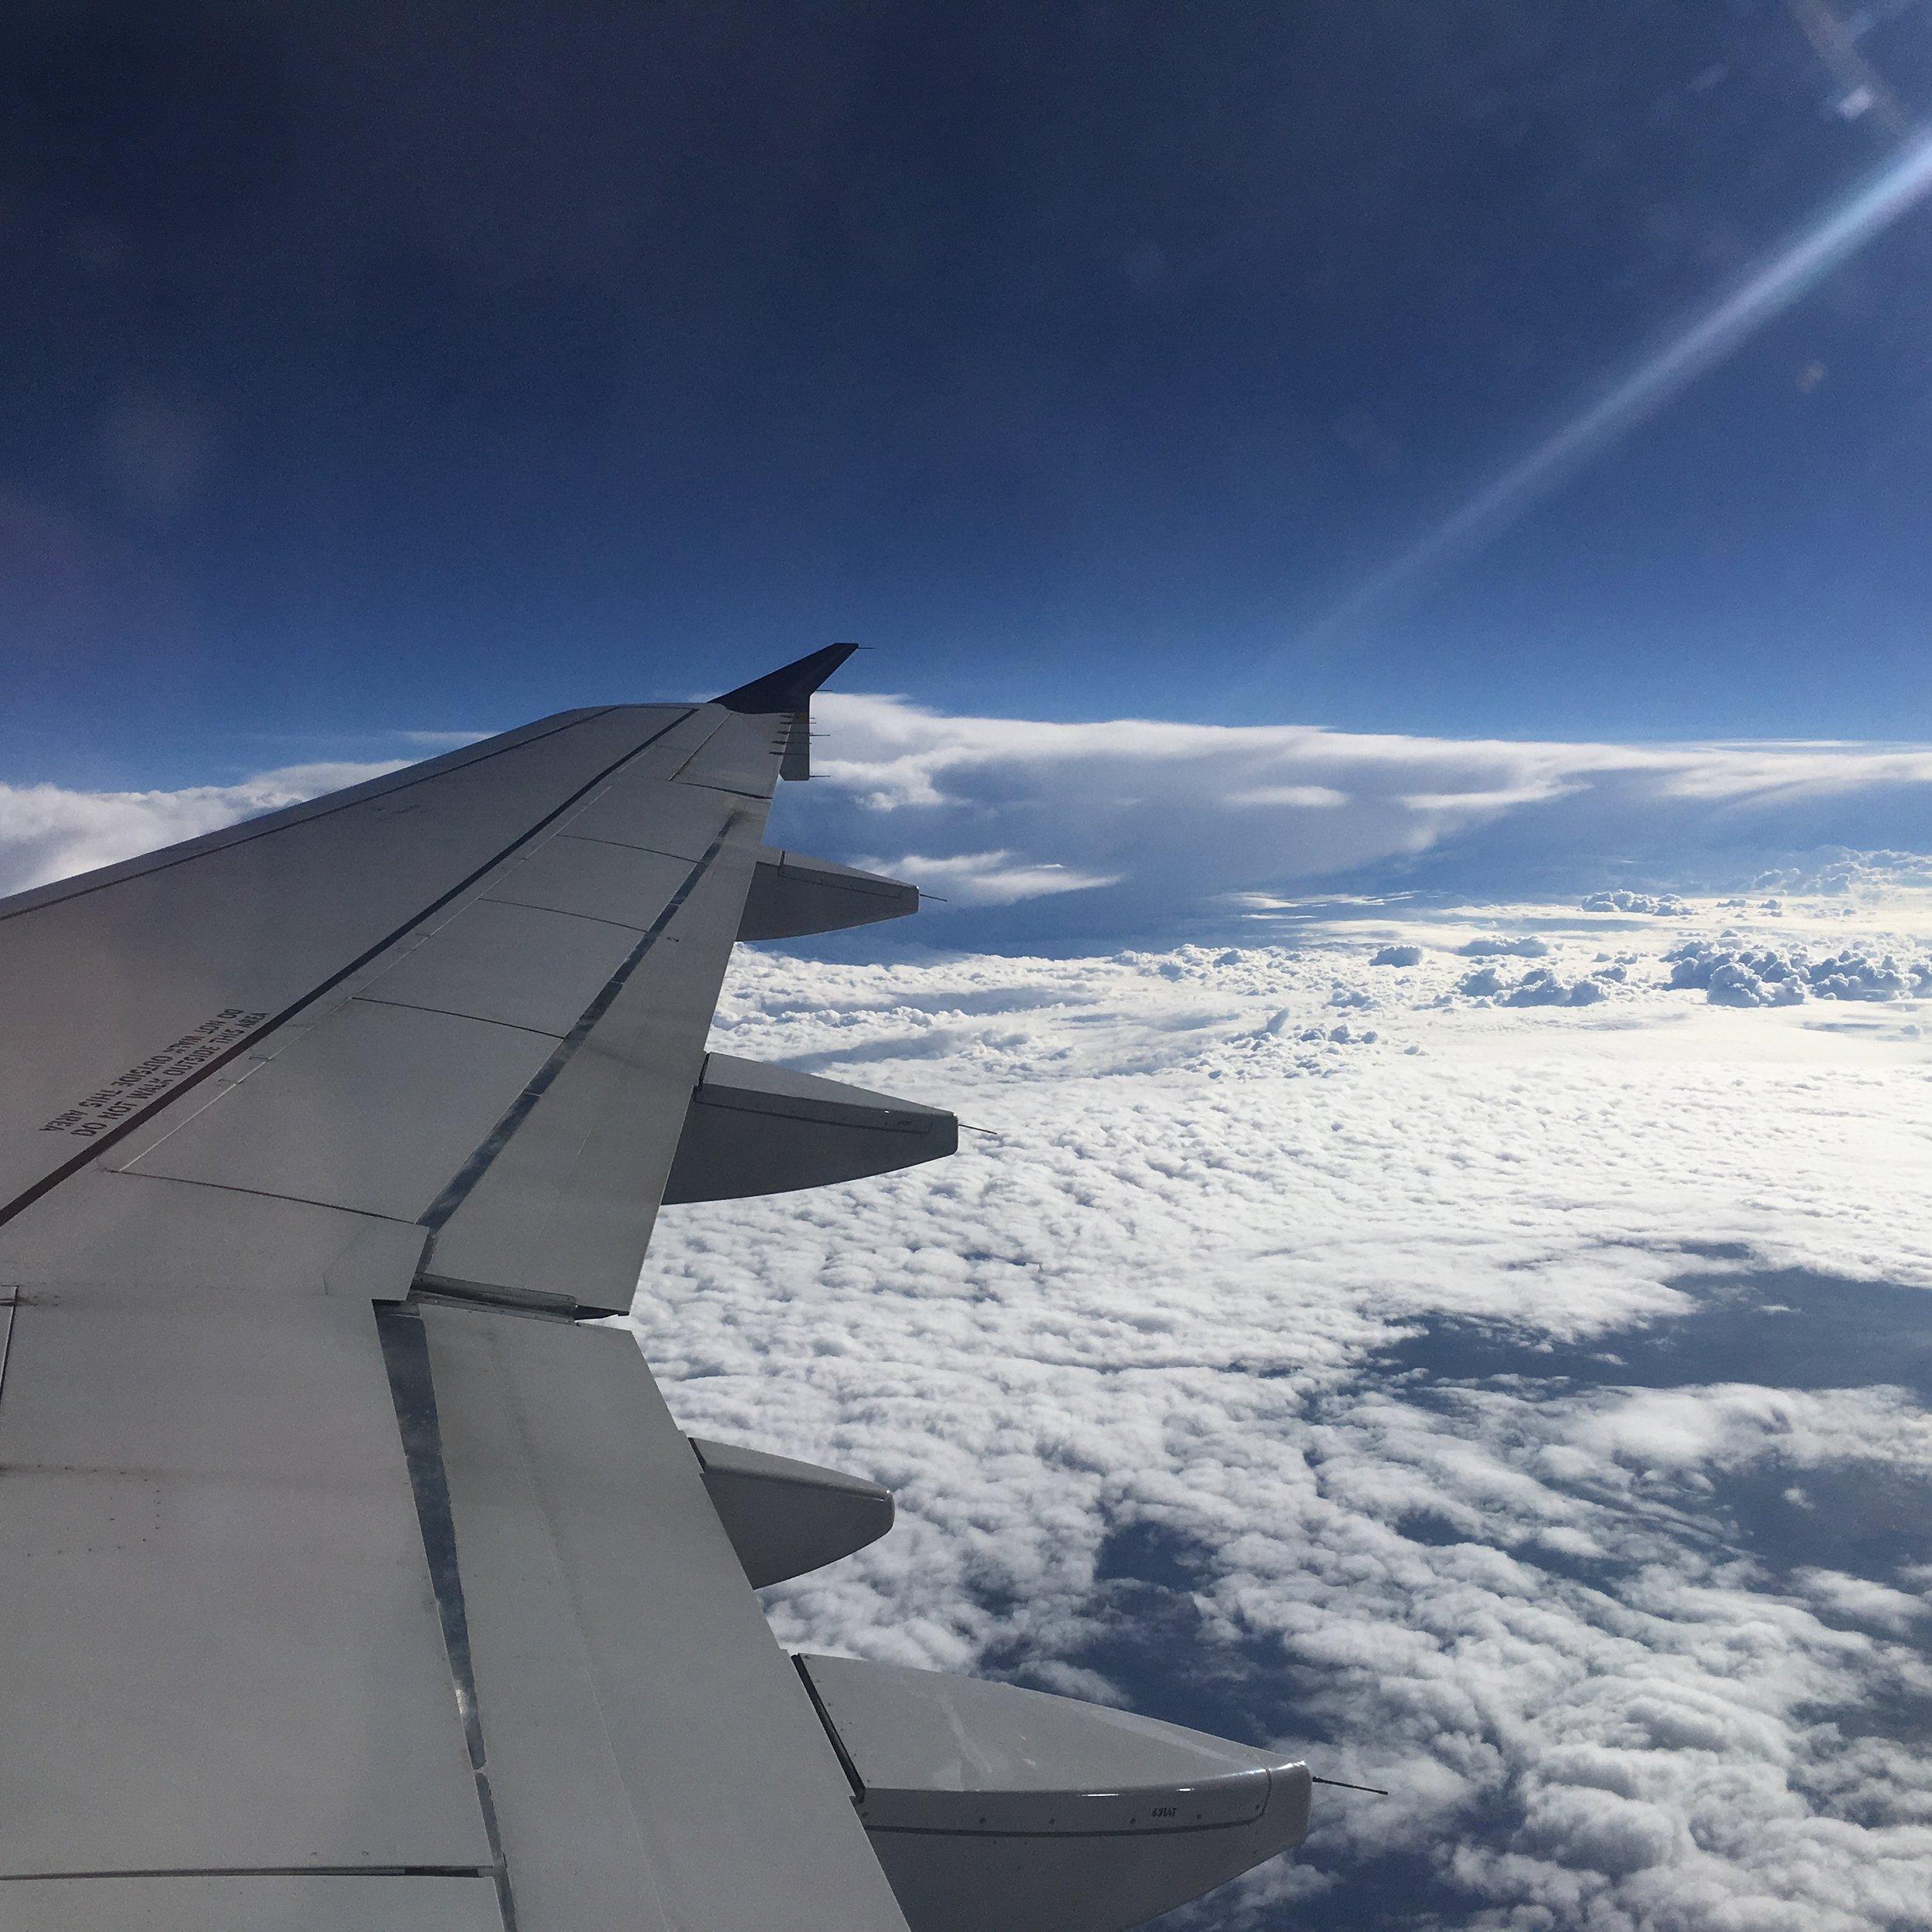 LEISUREMANN'S UNITED AIRLINES FRIENDLY SKIES